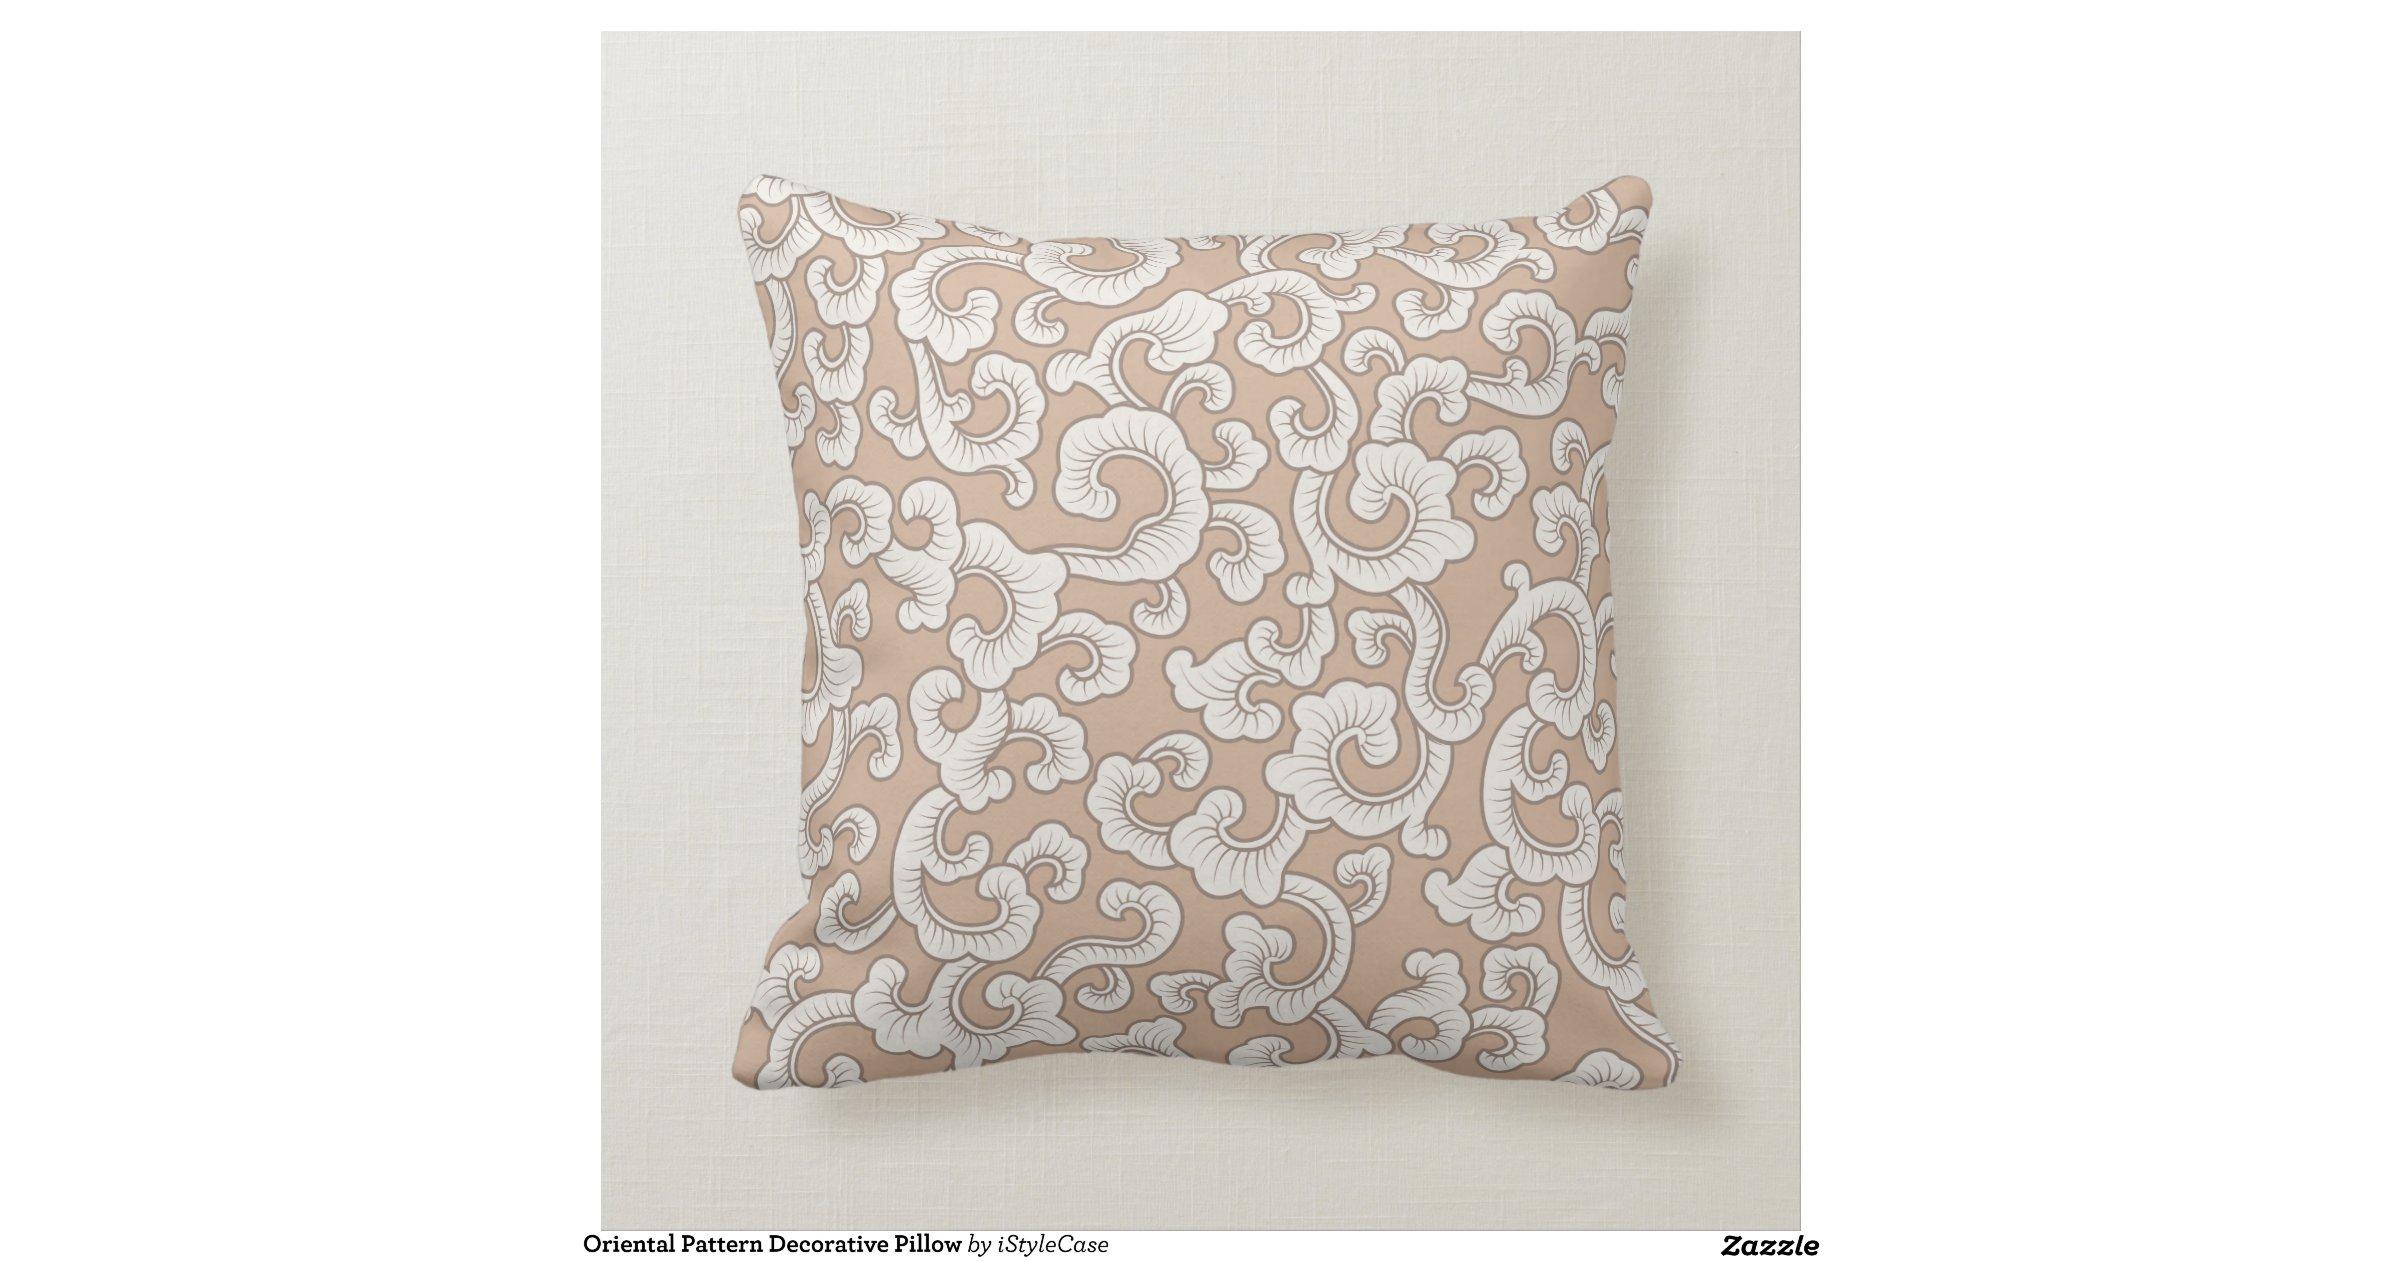 Oriental Decorative Pillows : Oriental Pattern Decorative Pillow Zazzle